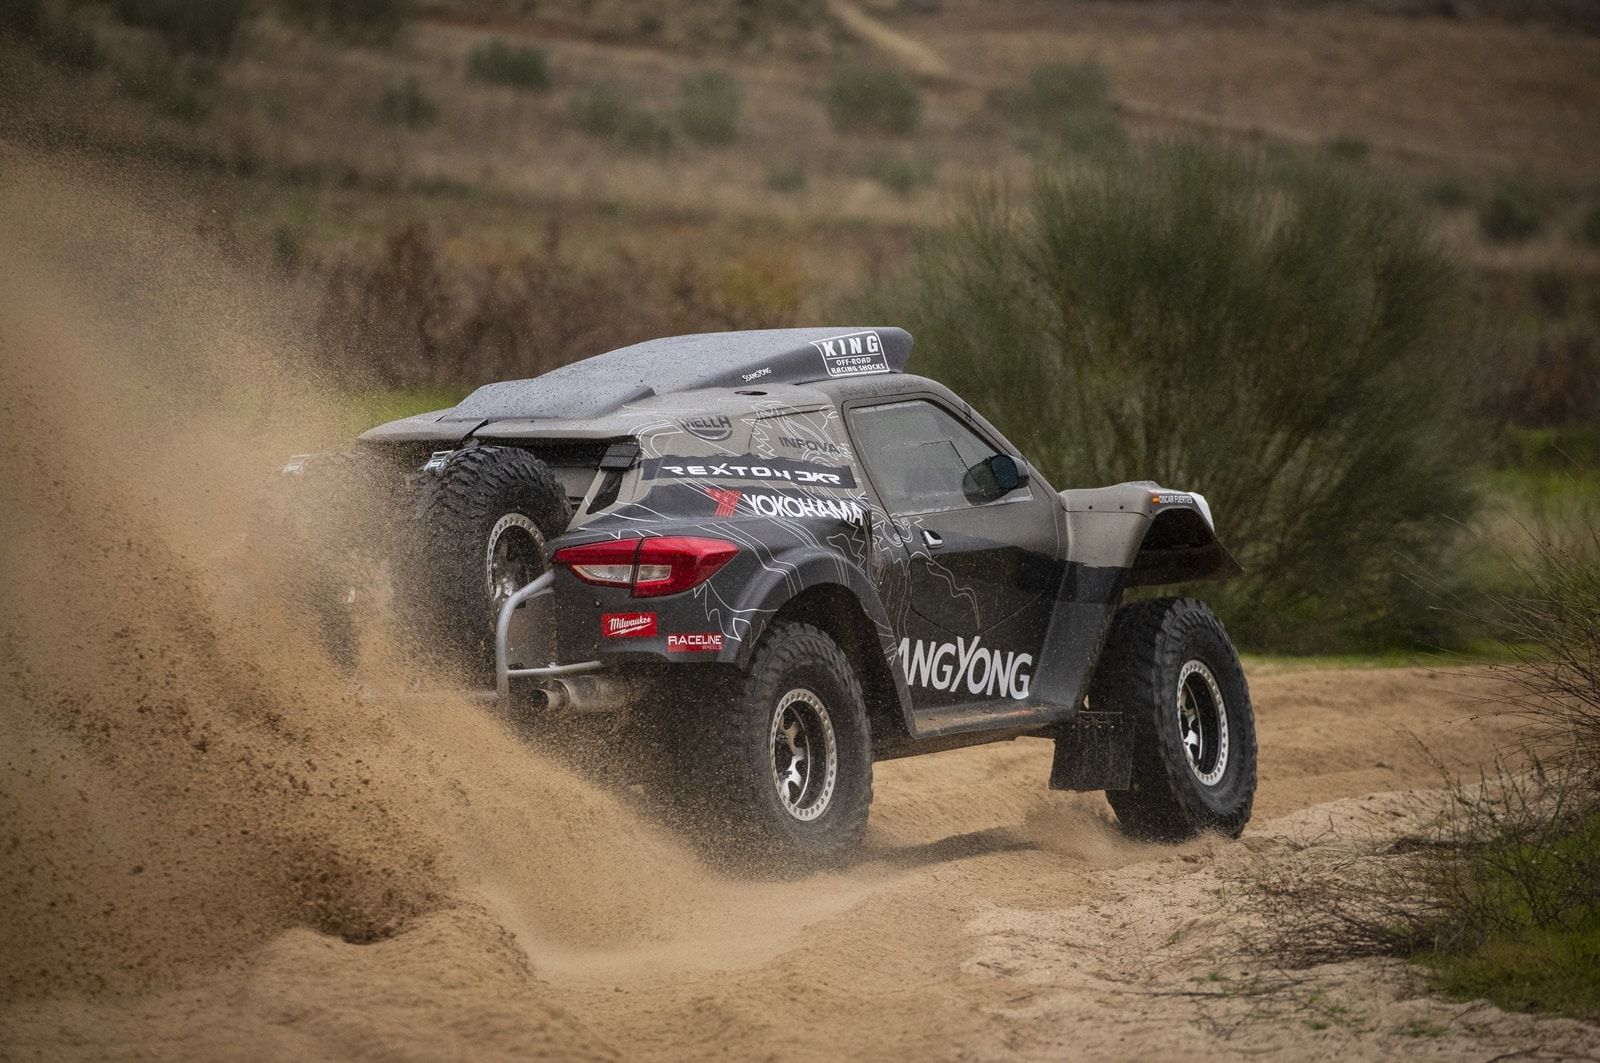 SsangYong vuelve con fuerza al Dakar con el Rexton DKR 2019: Un producto 'made in Spain'